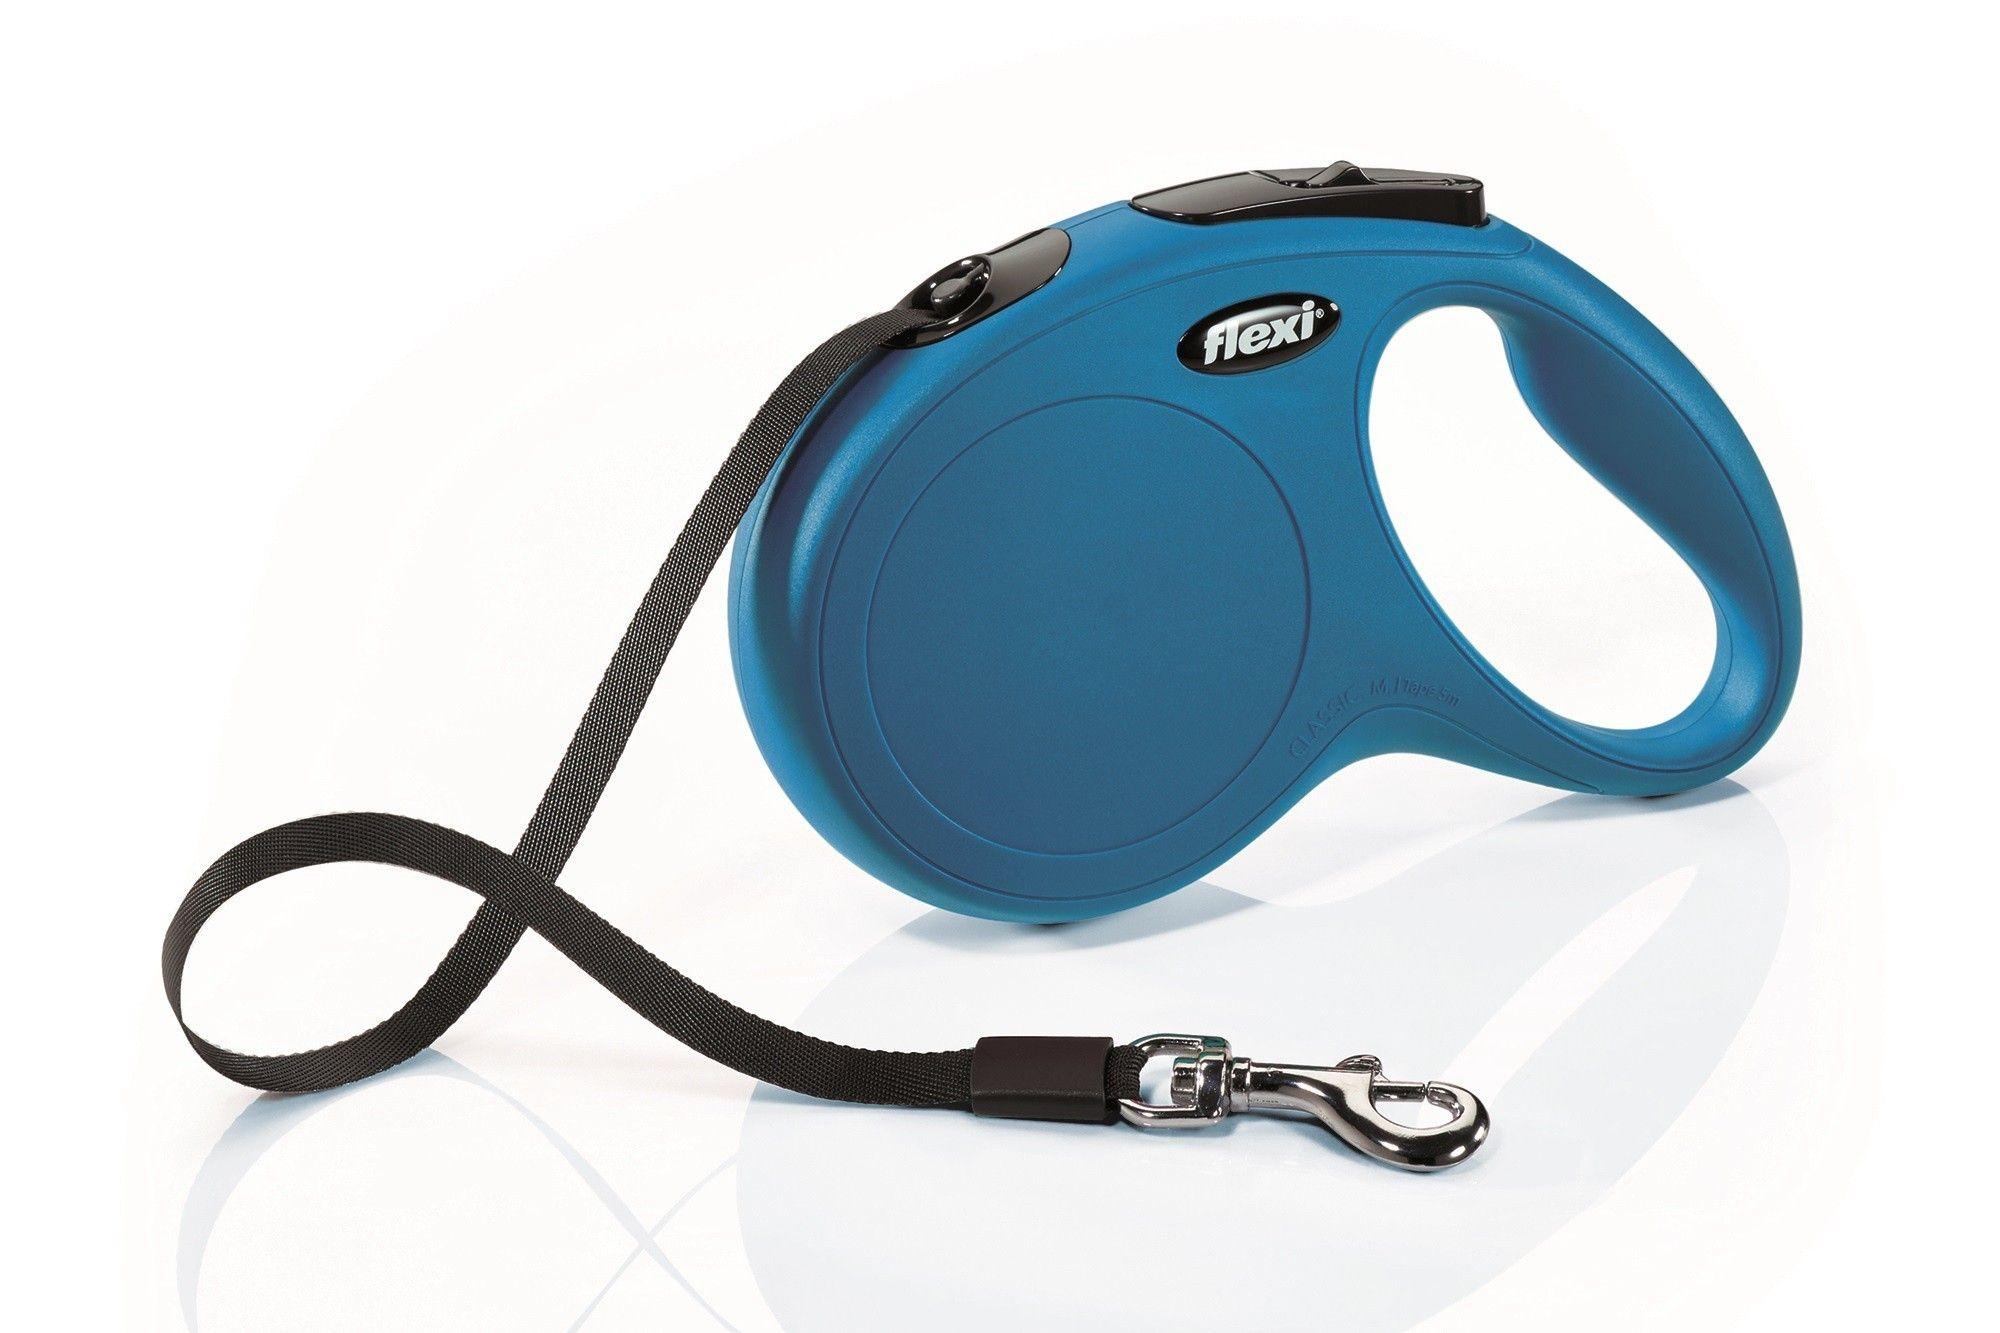 Flexi lijn New Classic Band 5mtr Blauw